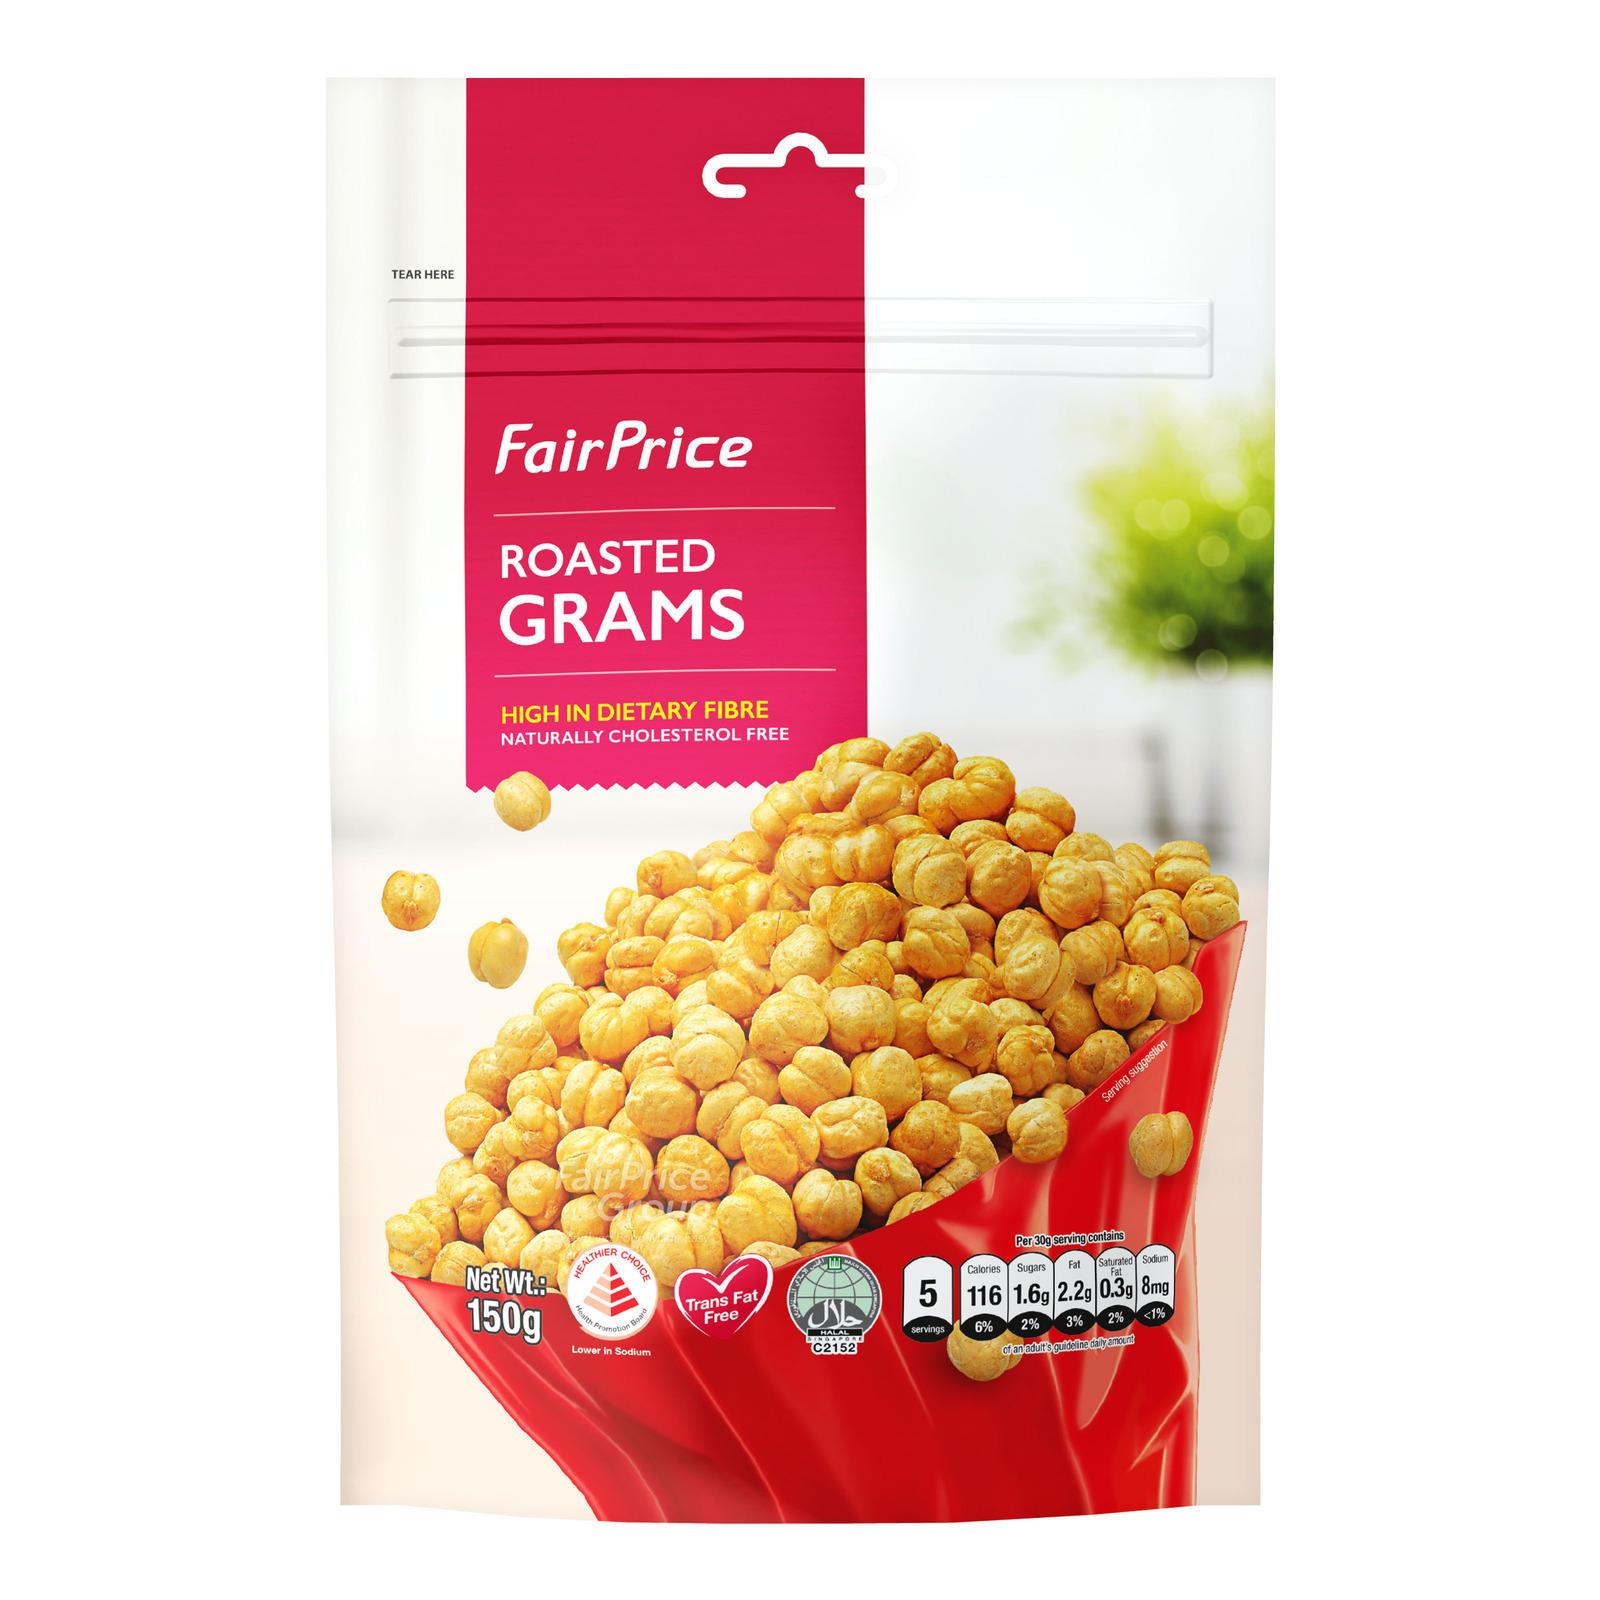 FairPrice Roasted Grams